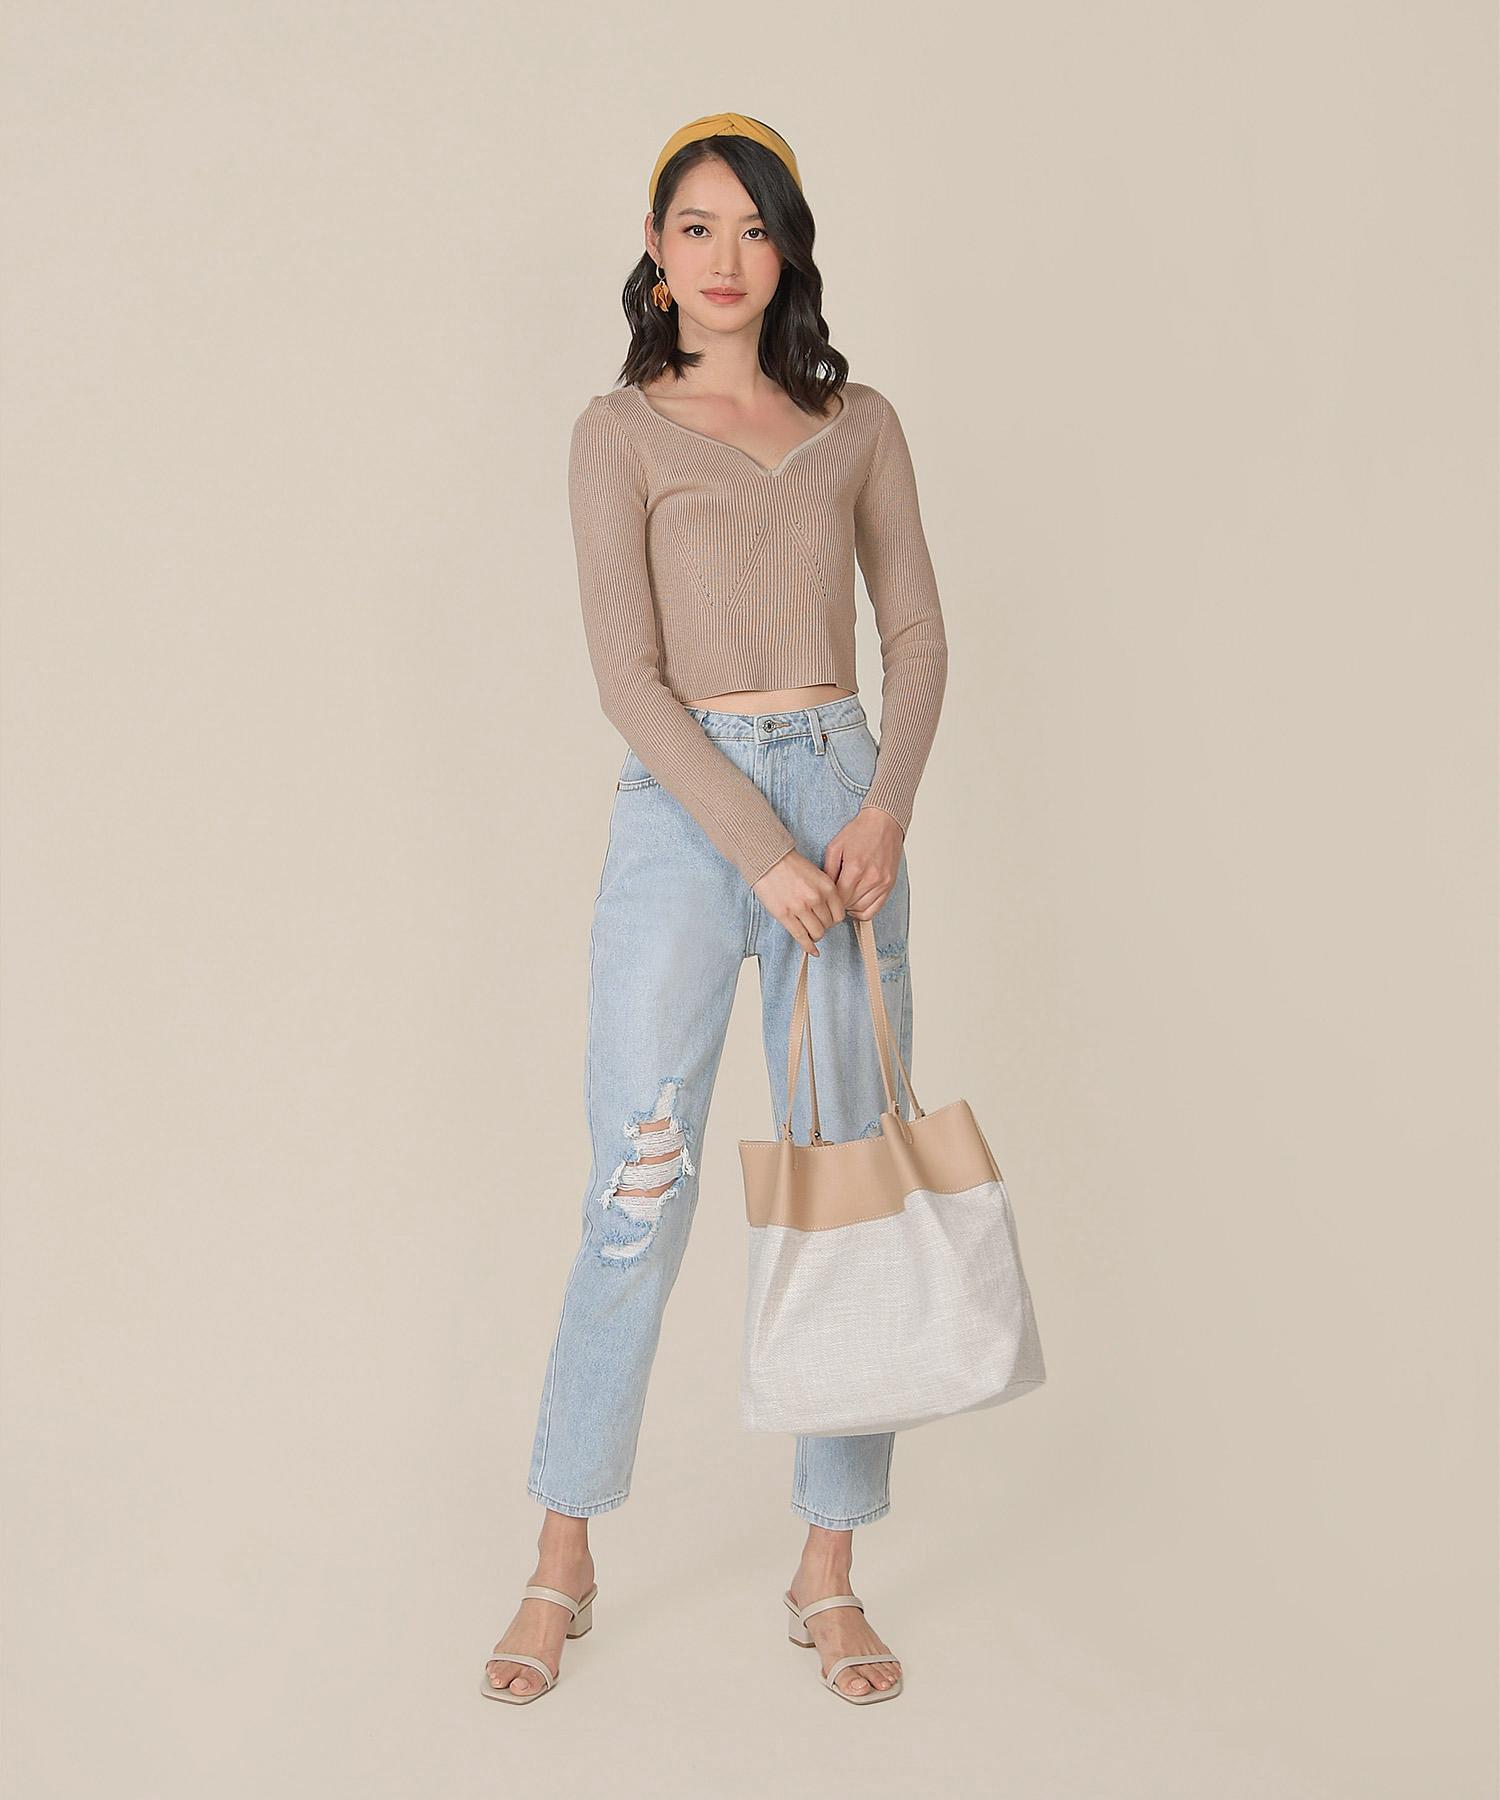 rio-vista-knit-top-taupe-3